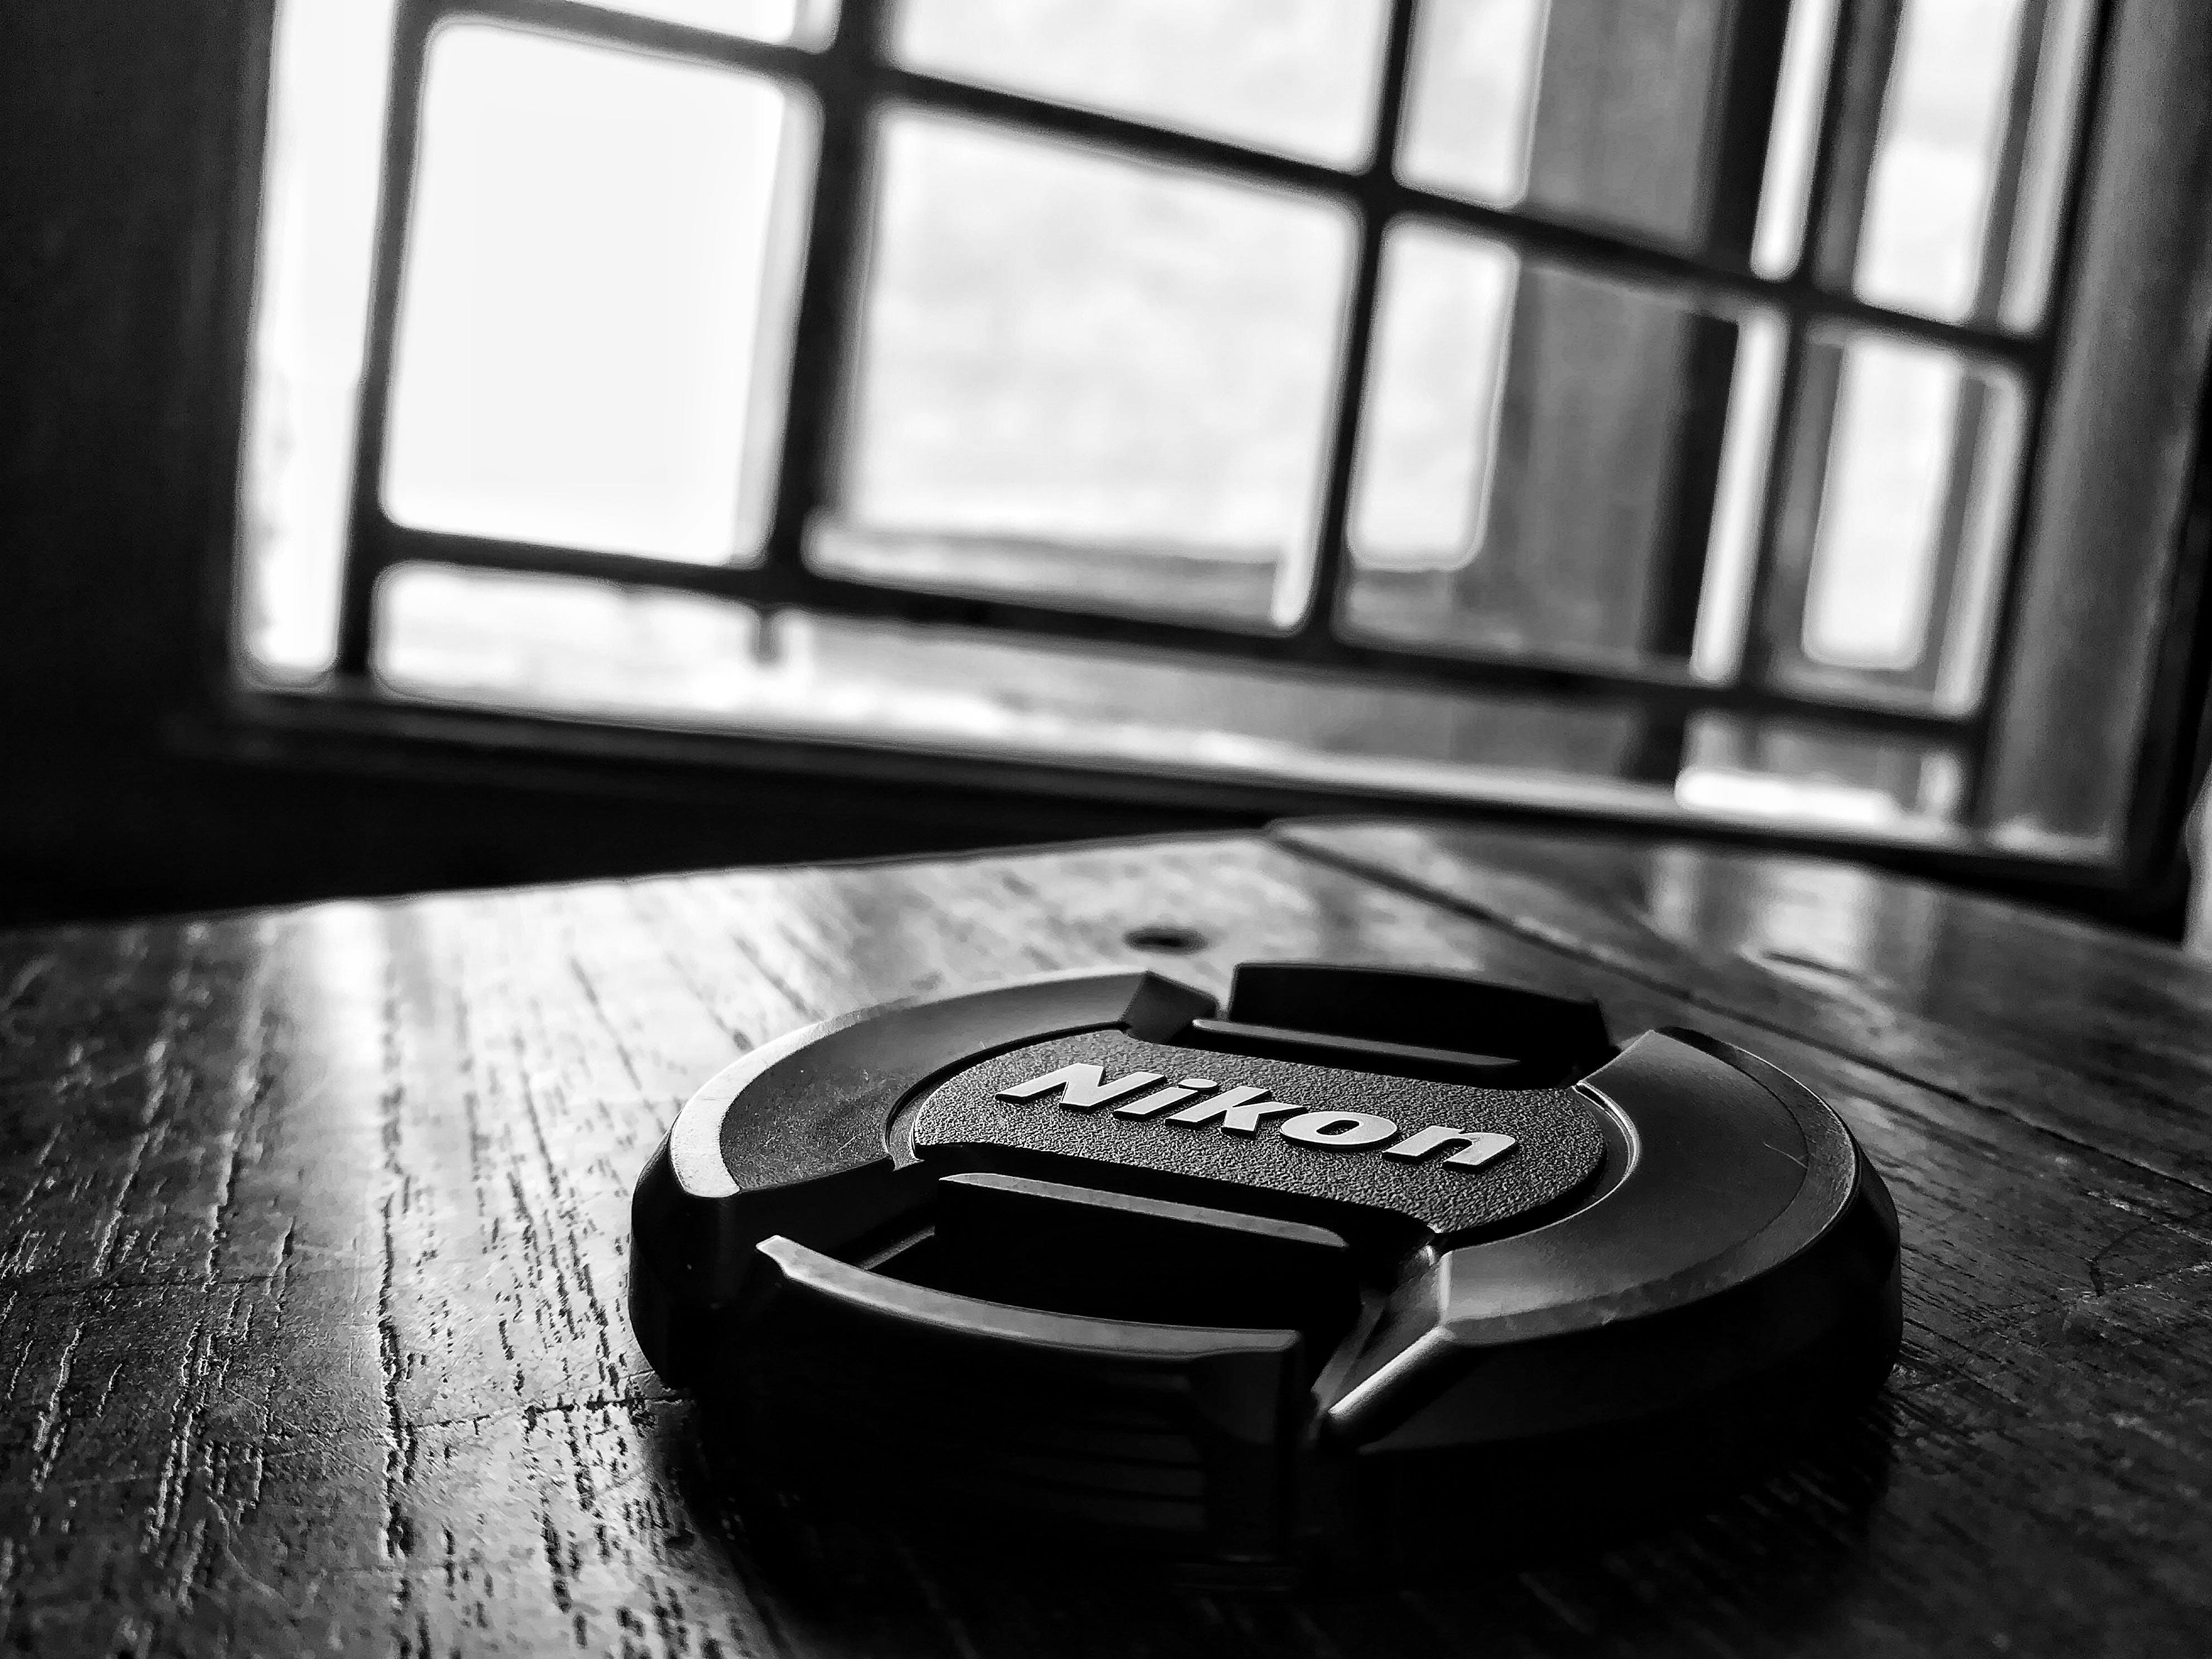 Free stock photo of black and white, home interior, inside, macro photo